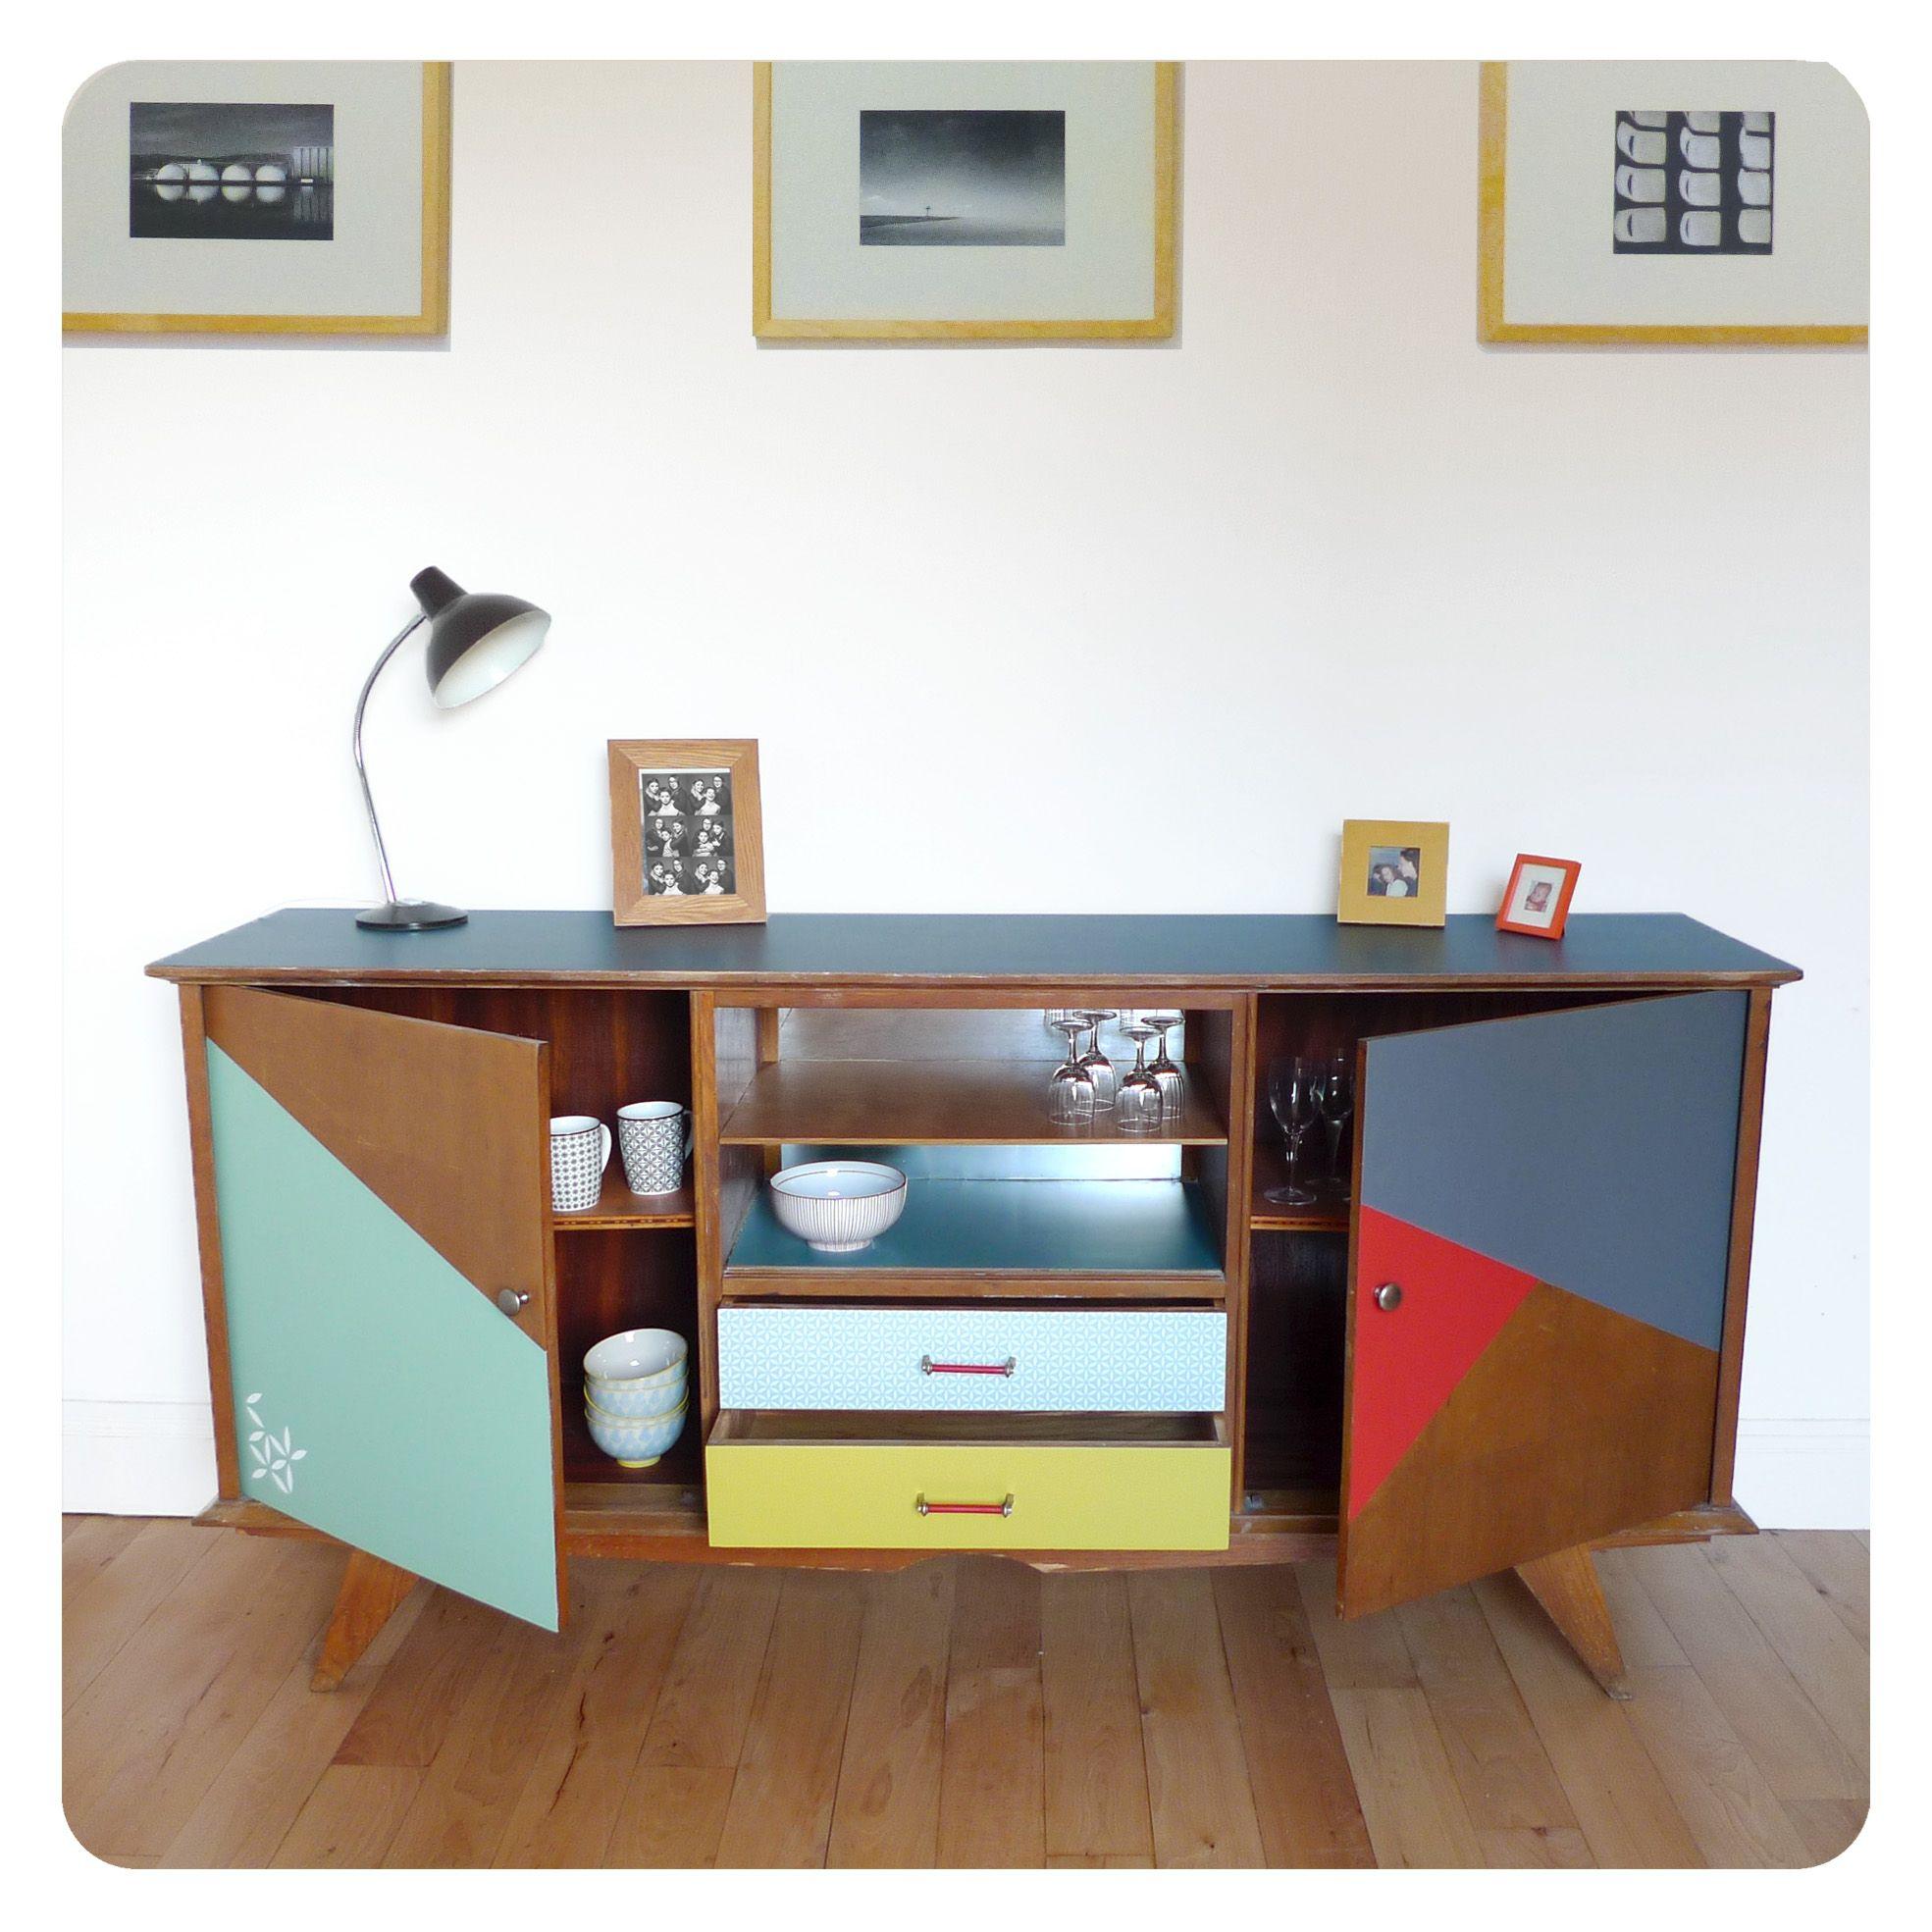 Enfilade vintage - | Retro Furniture | Pinterest | Buffet, Paint ...